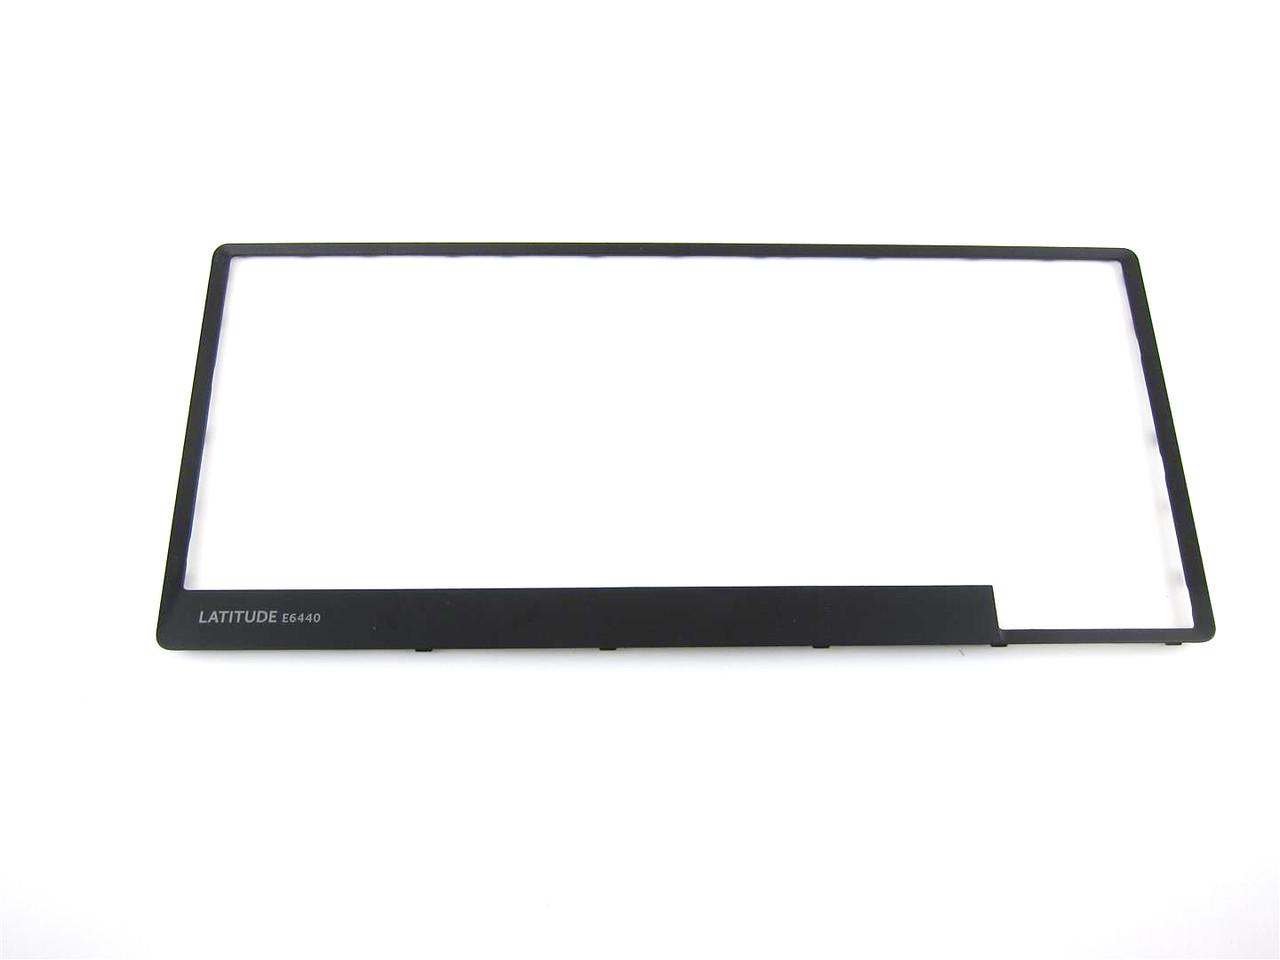 Dell Latitude E6440 Single Pointing Keyboard Bezel Trim Overlay - 2GKGY